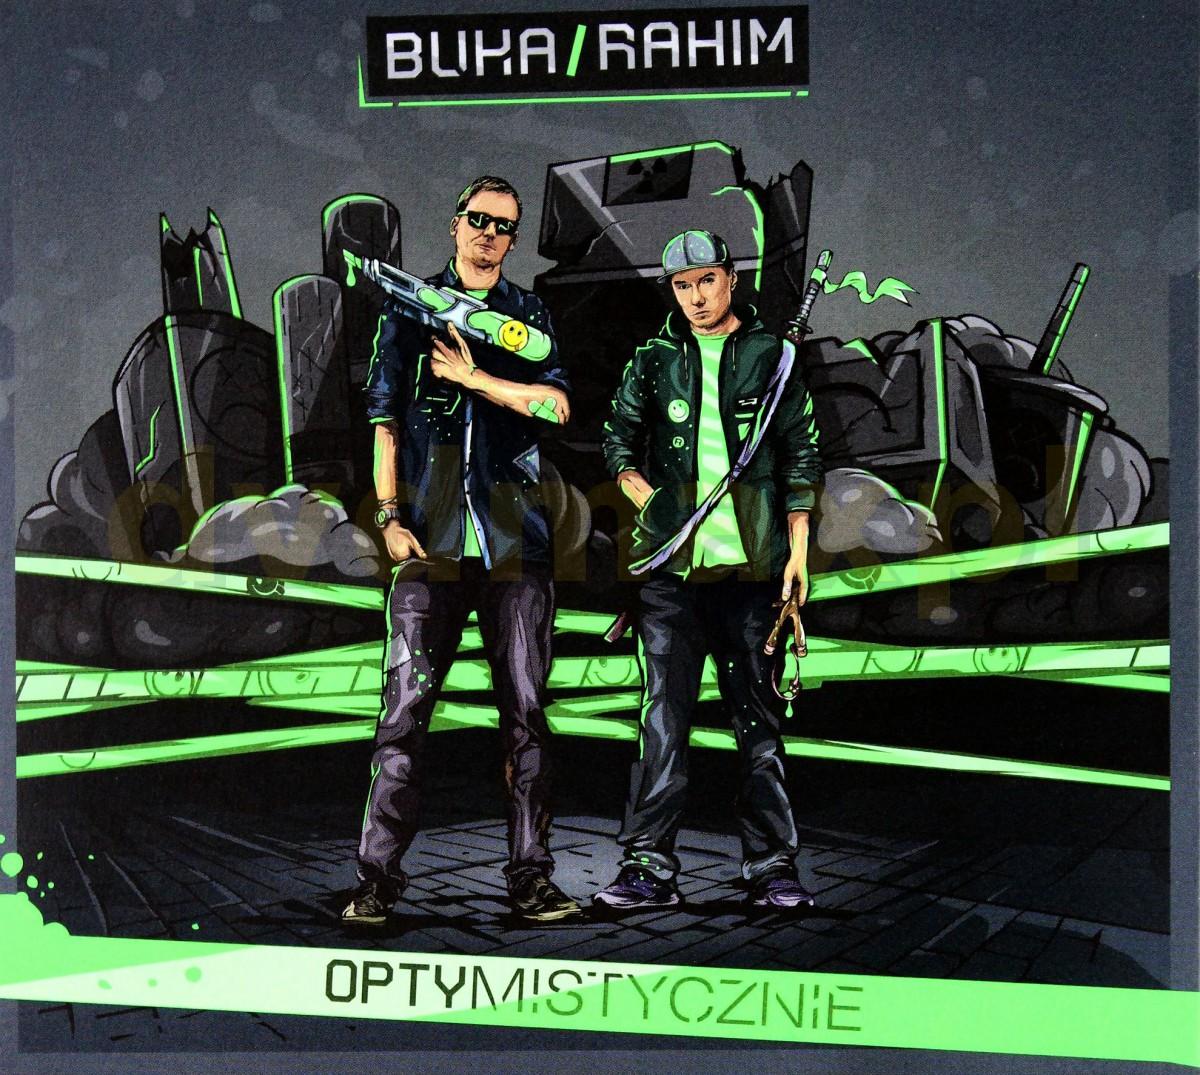 Buka & Rahim ft. Fokus, Masia - Z archiwum twarzy